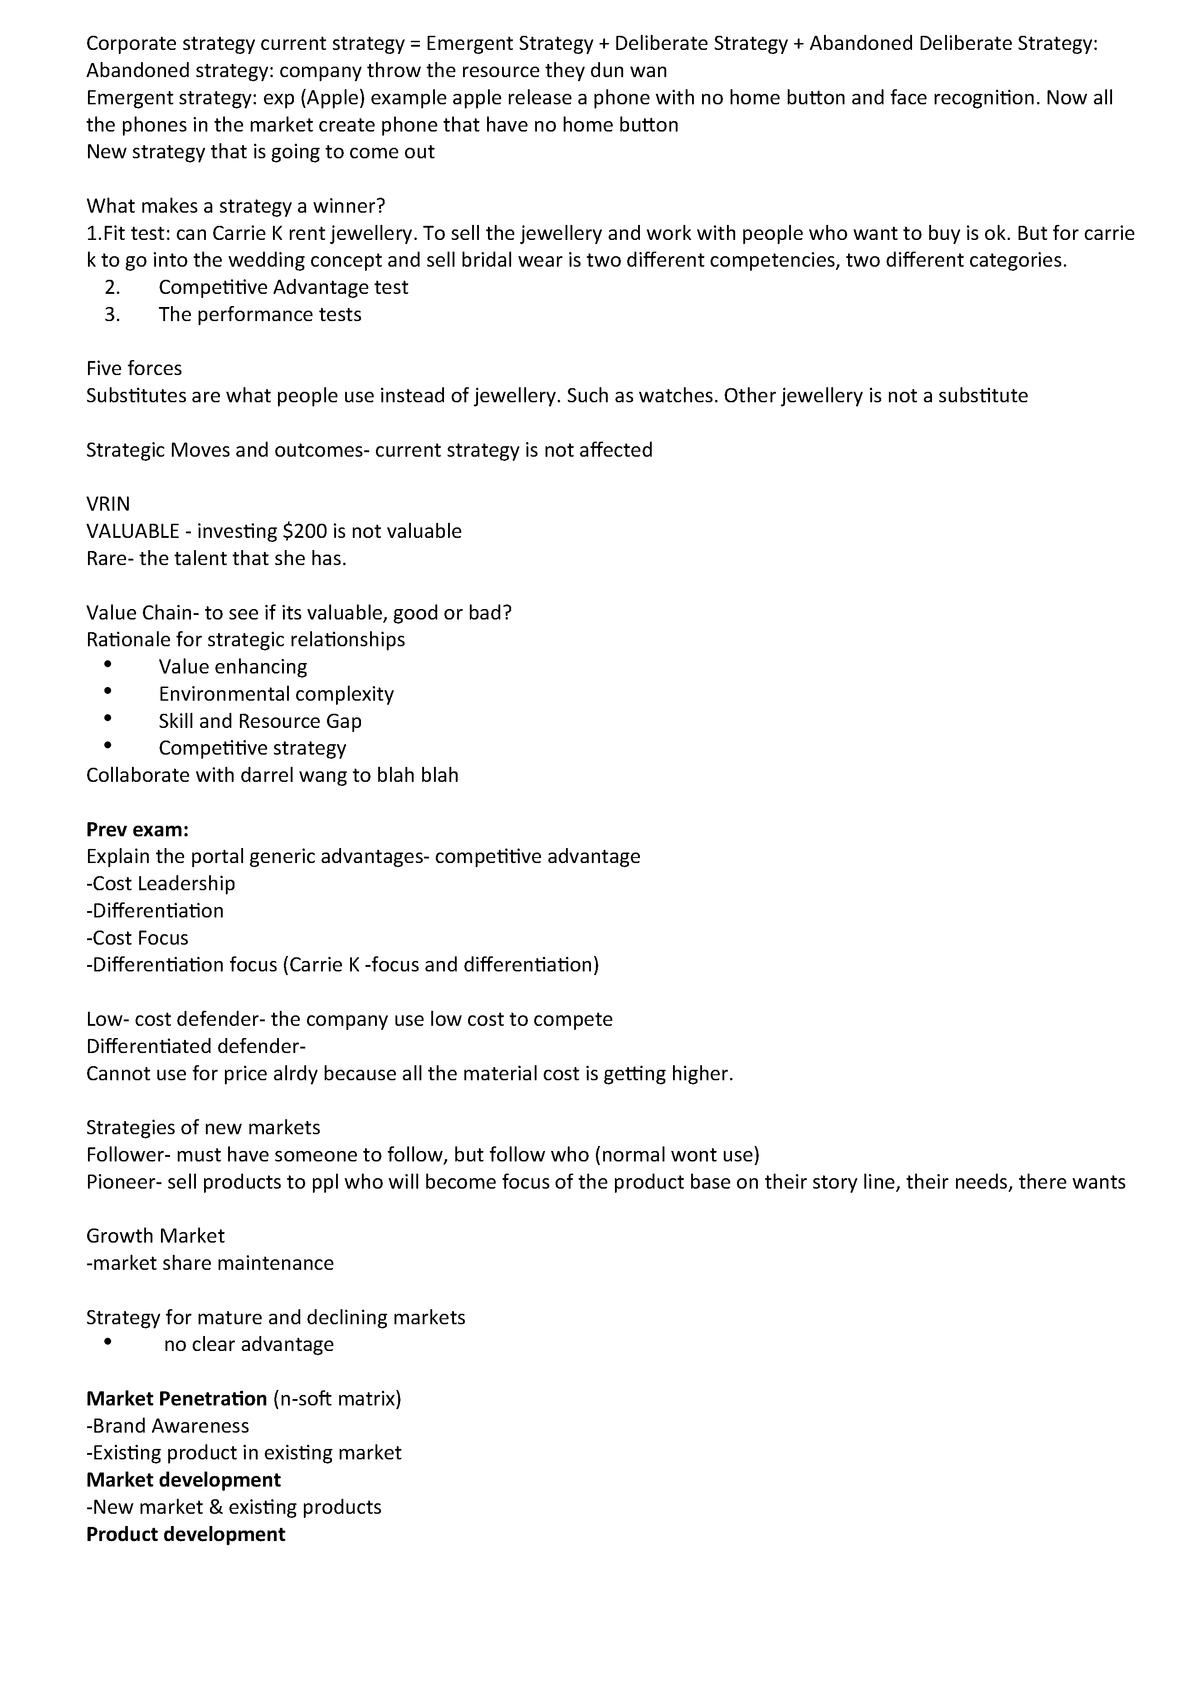 SM Review Notes - MKTG1260: Strategic Marketing - StuDocu